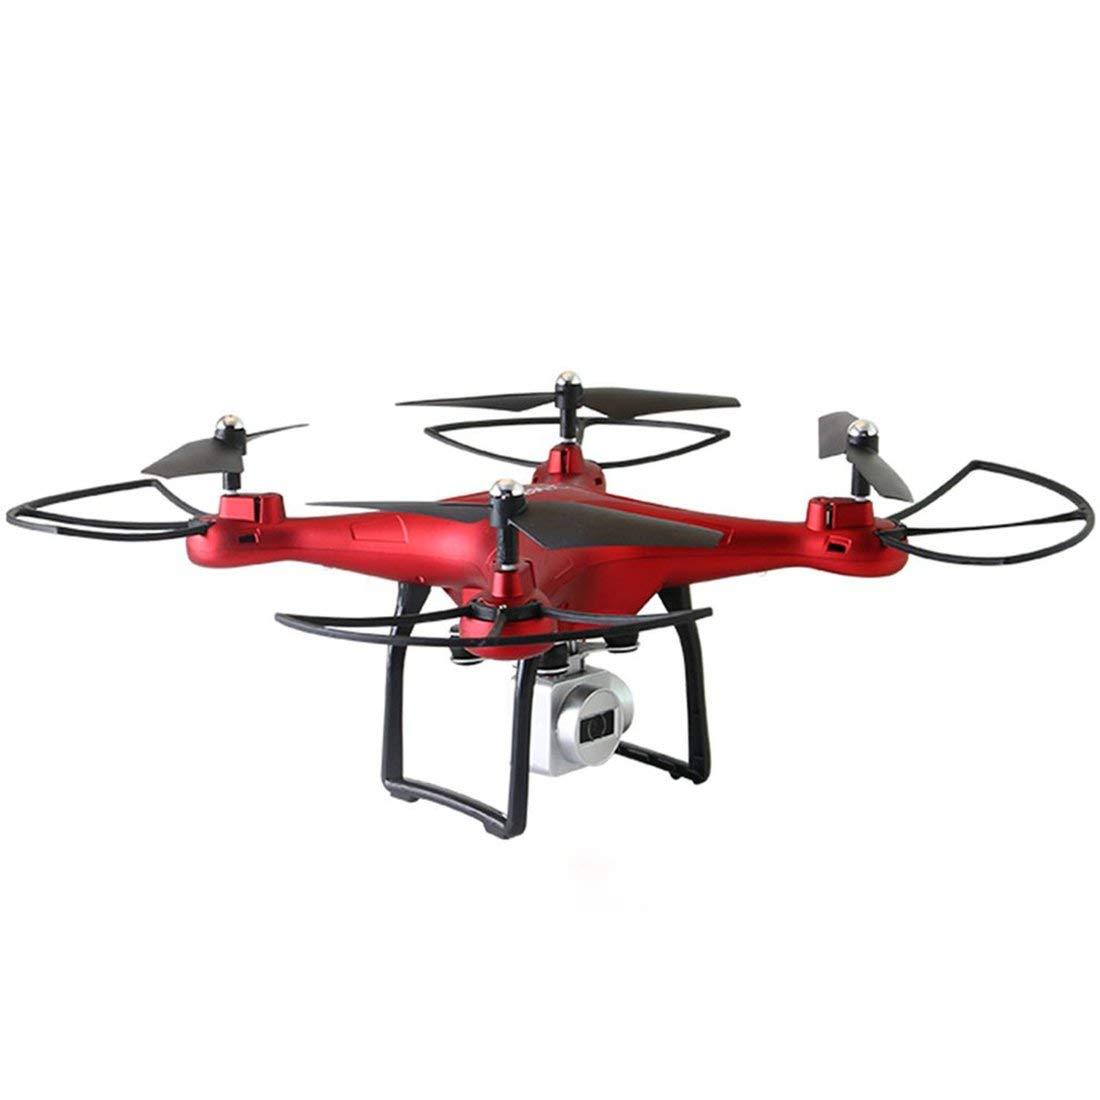 Formulaone SMRC SMRC SMRC S10 6-Achsen-Gyro-Mini-Drohne mit 0,3 Megapixel HD-Kamera 2.4G Höhenstand RC Quadcopter Hubschrauber f2037e